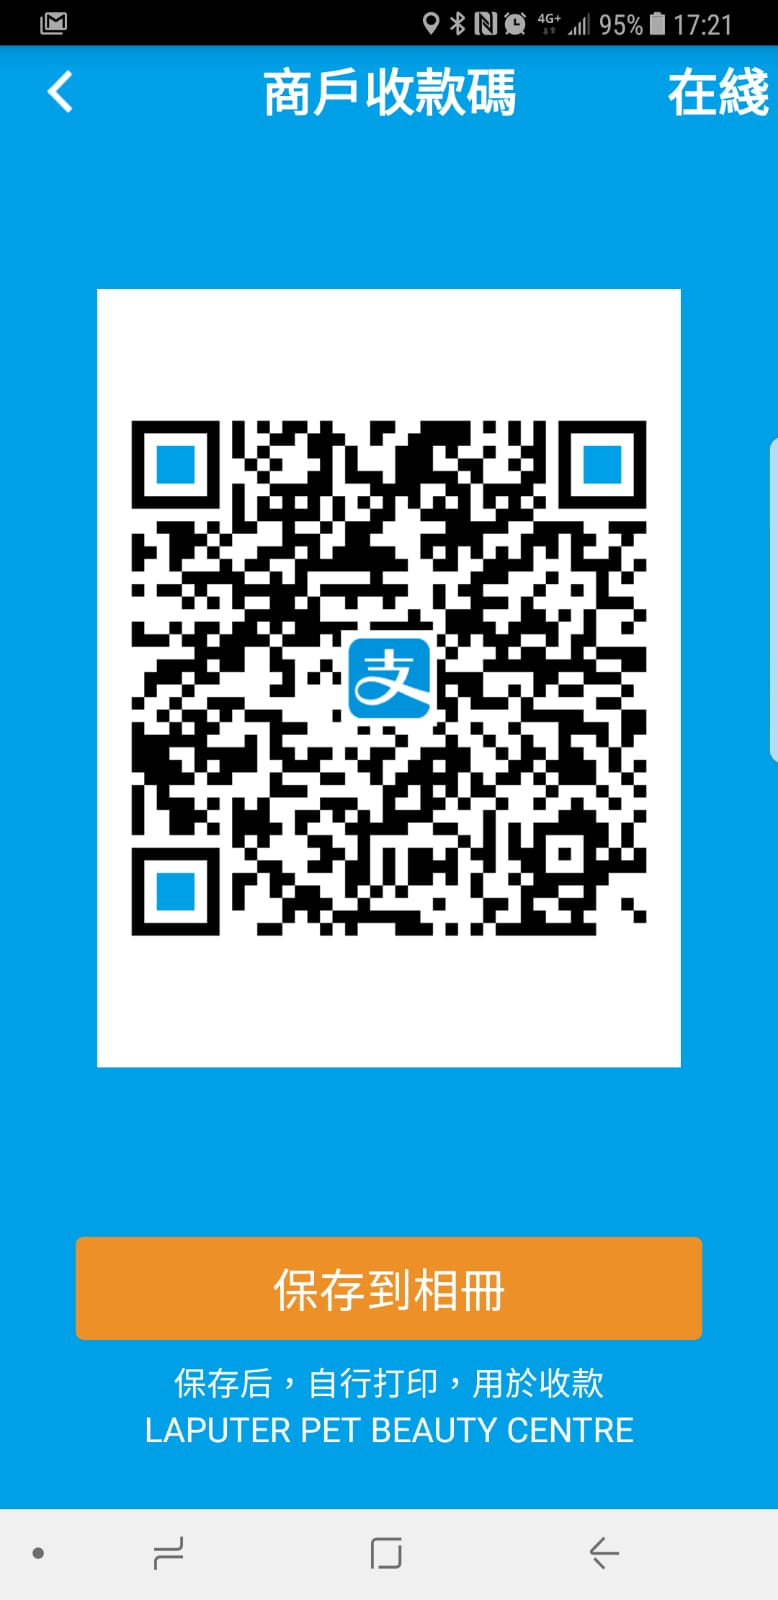 395349c4-8a32-40f3-864e-4e148f31b3b3.jpg